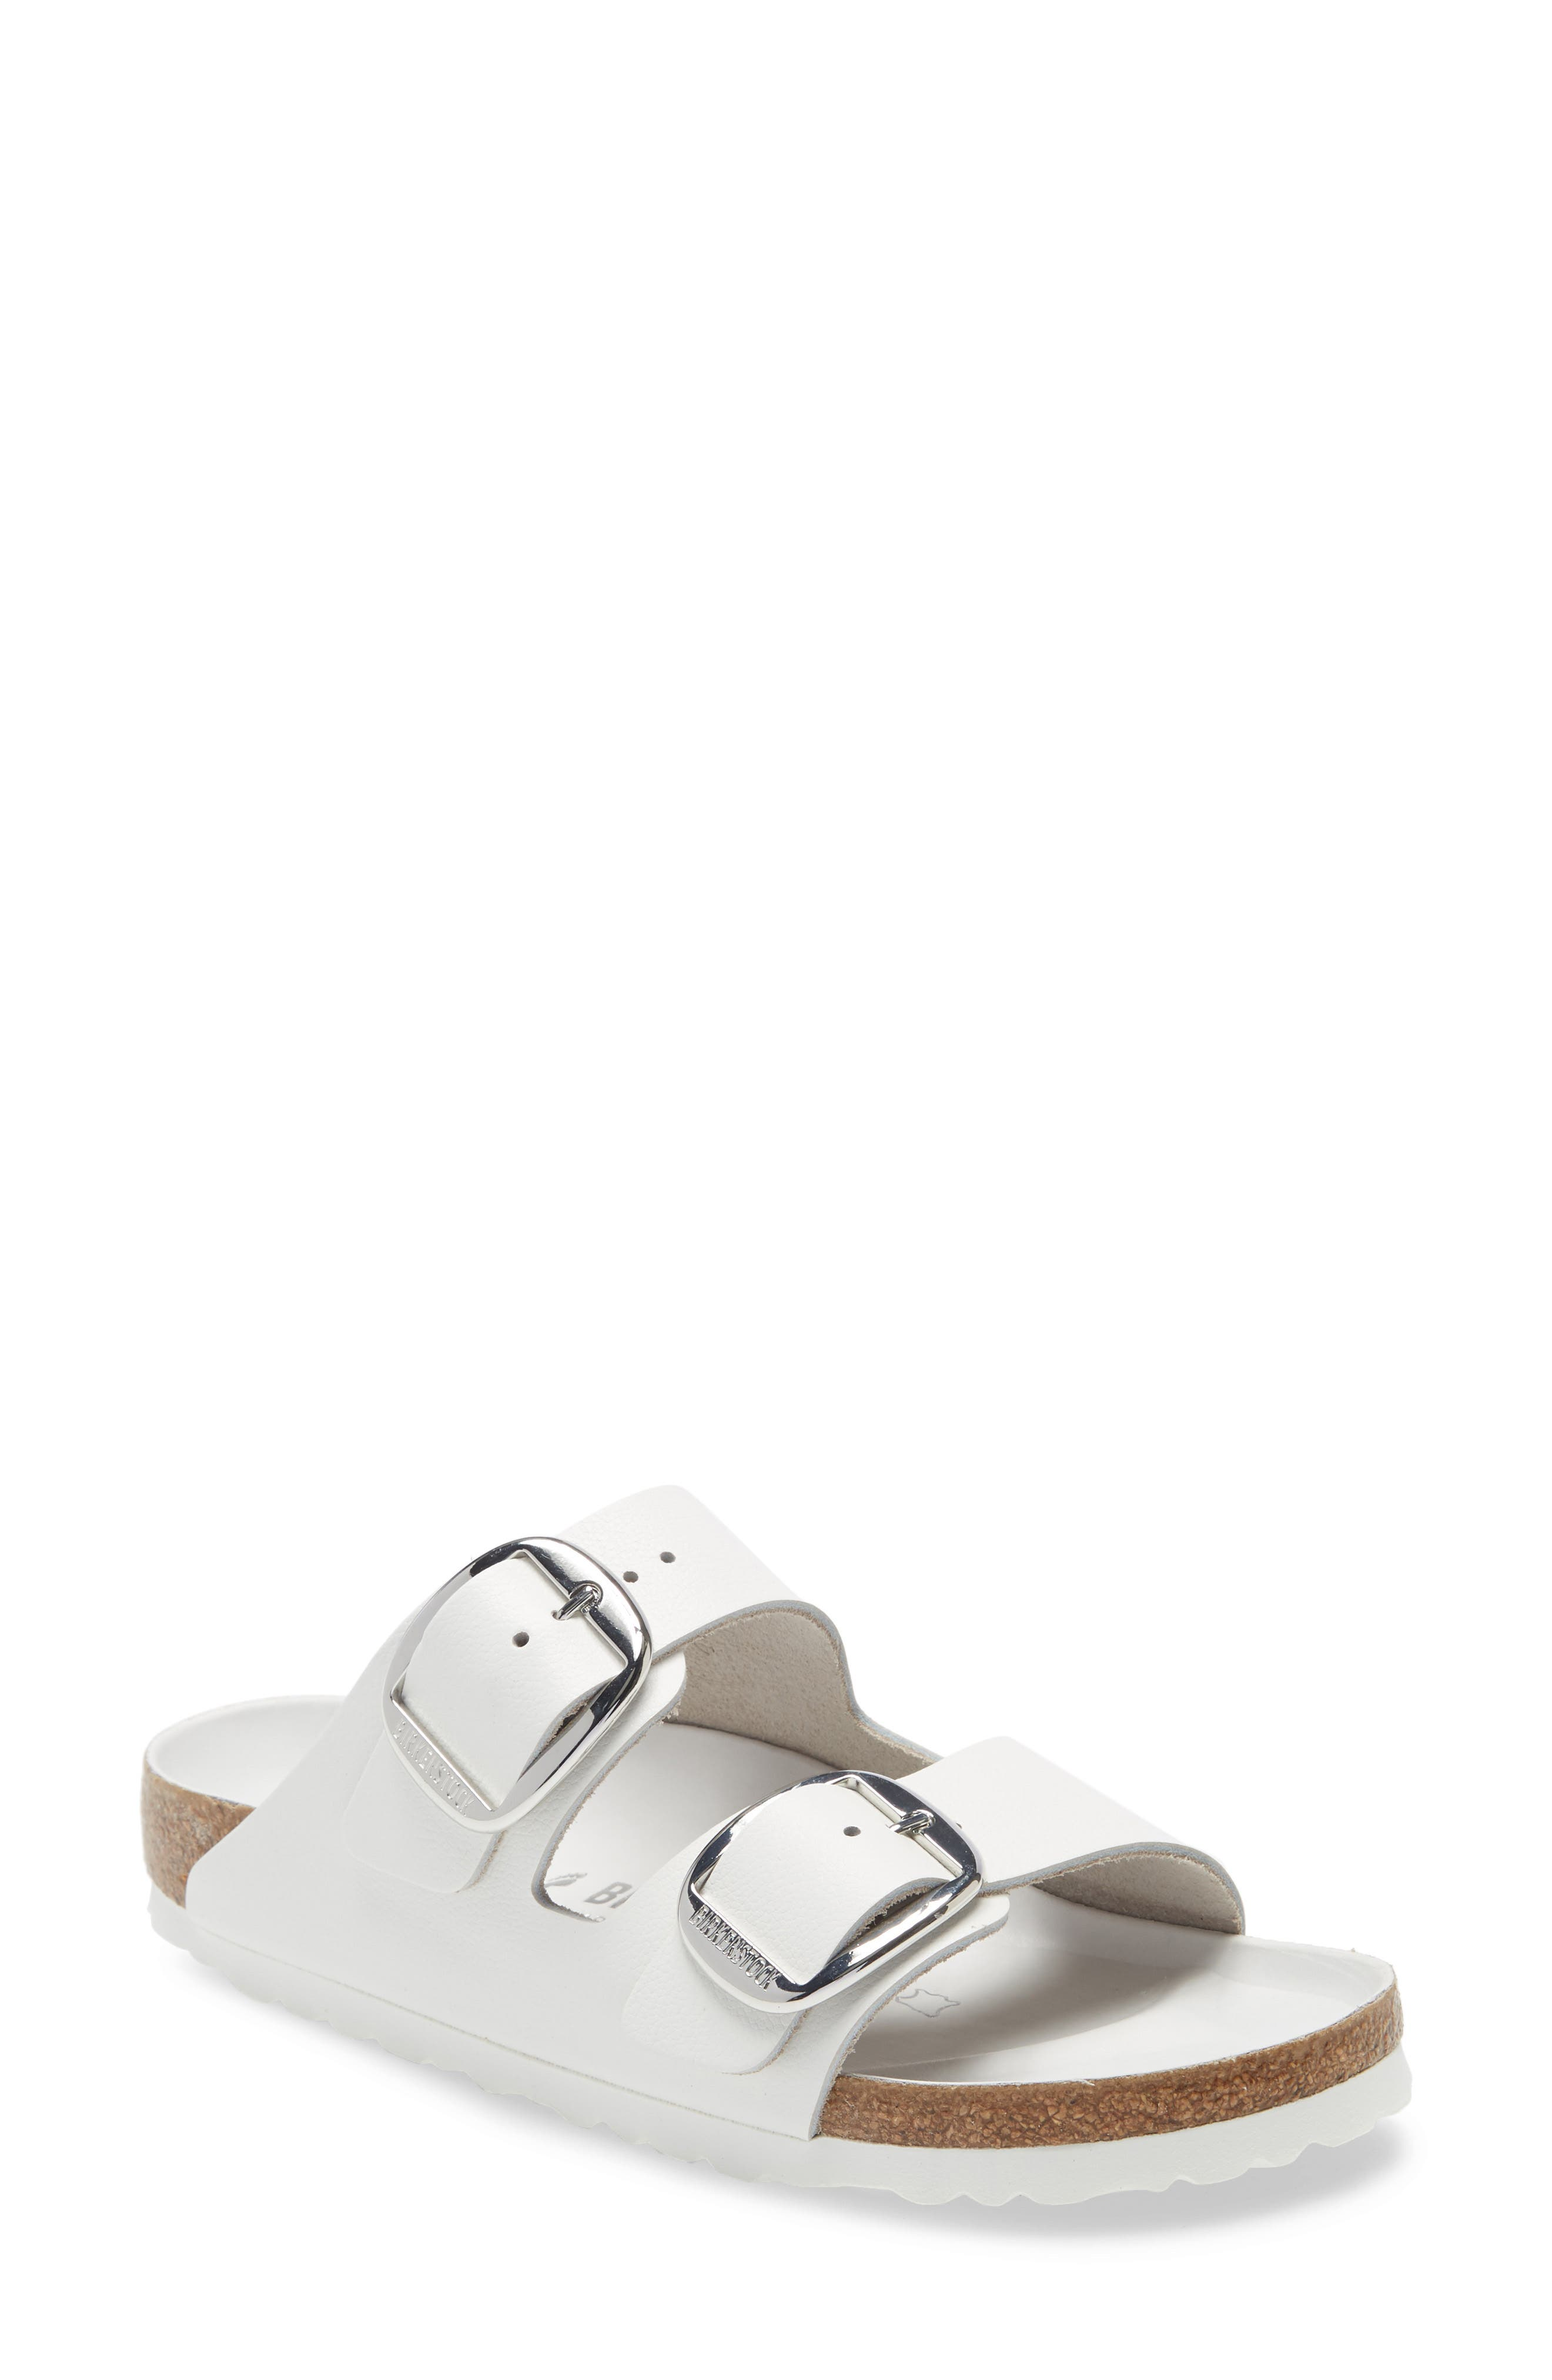 Women's White Mules \u0026 Slides | Nordstrom